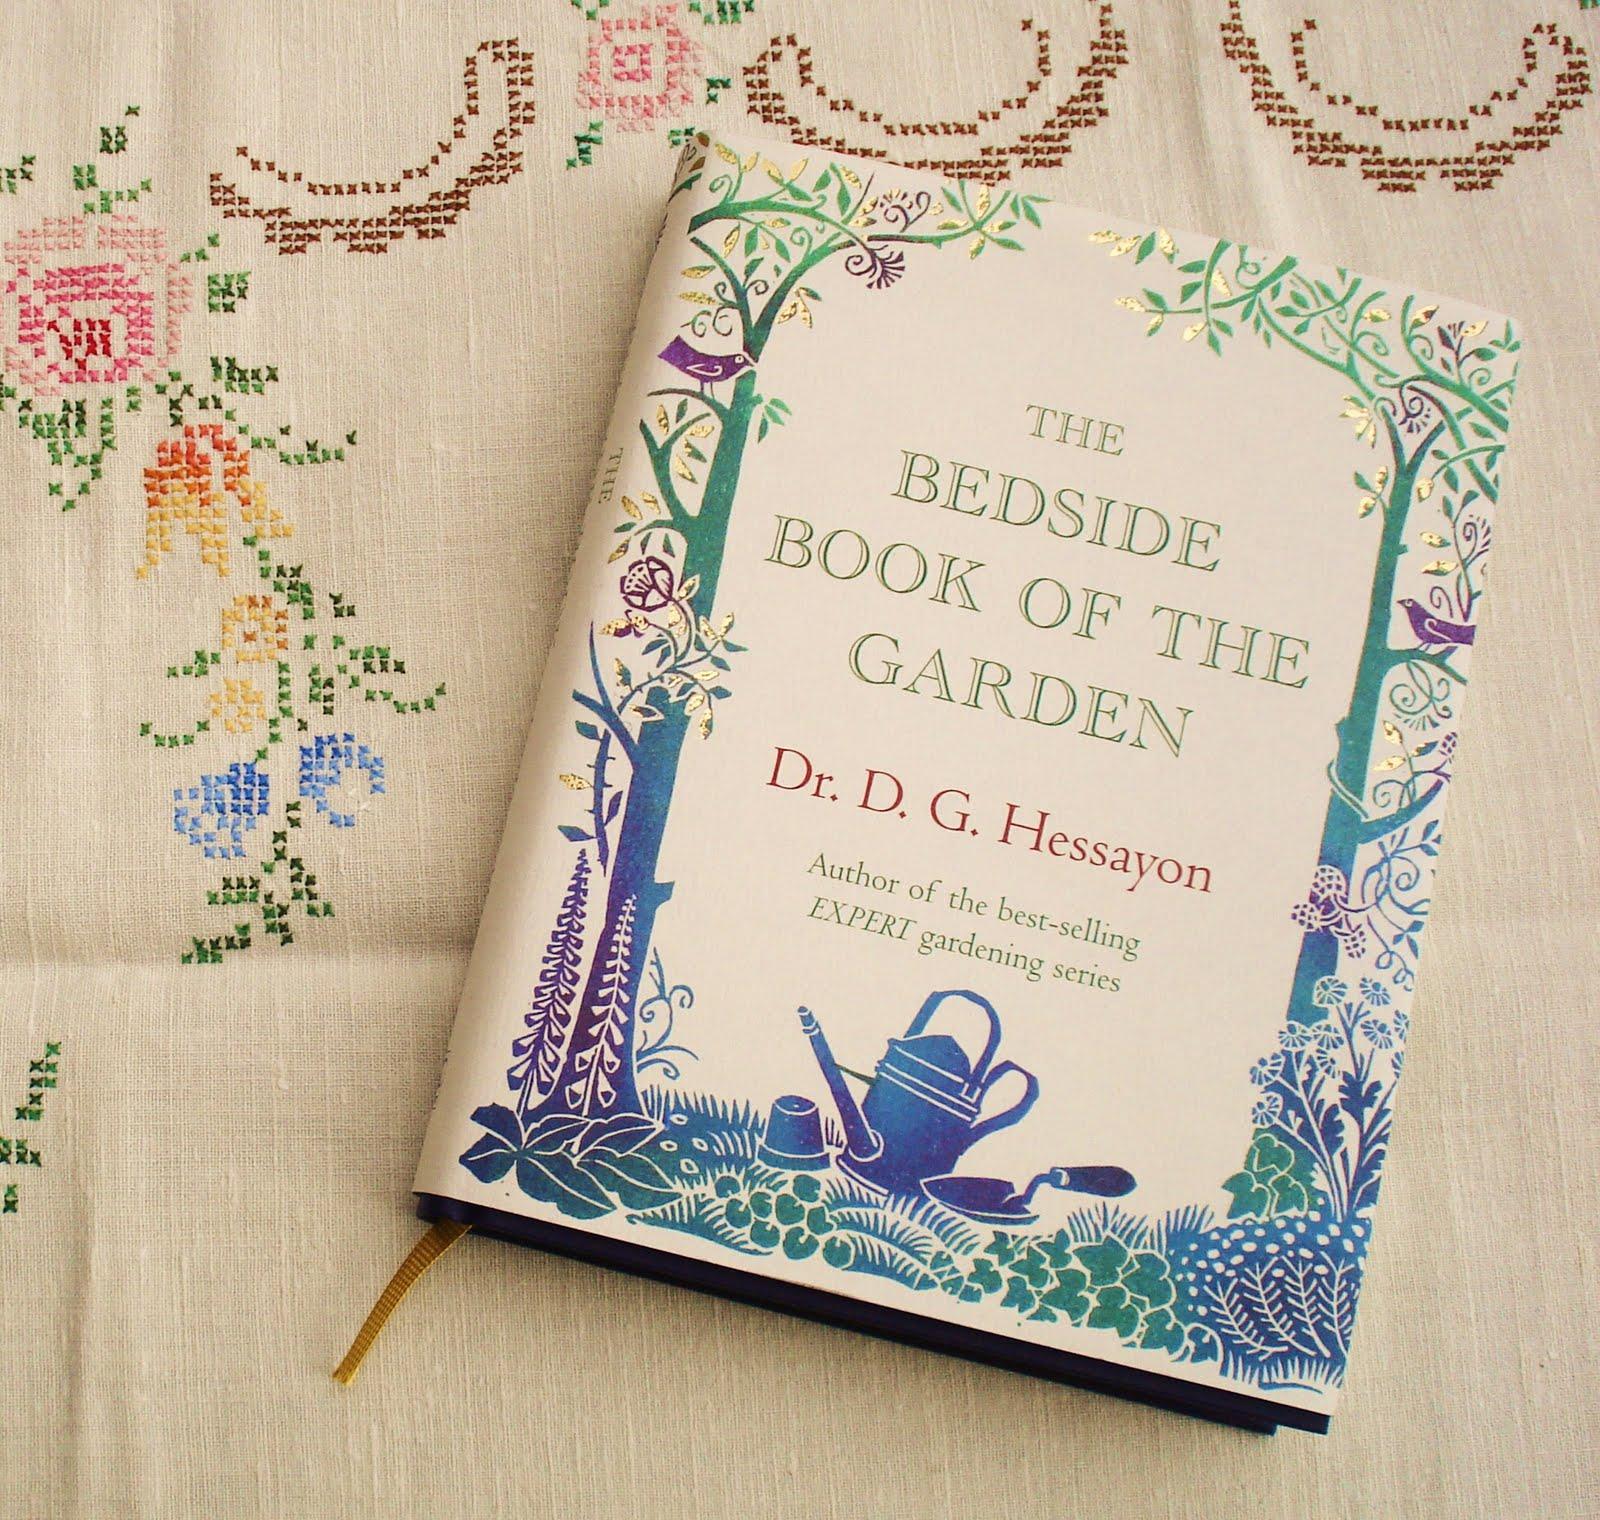 The garden expert hessayon